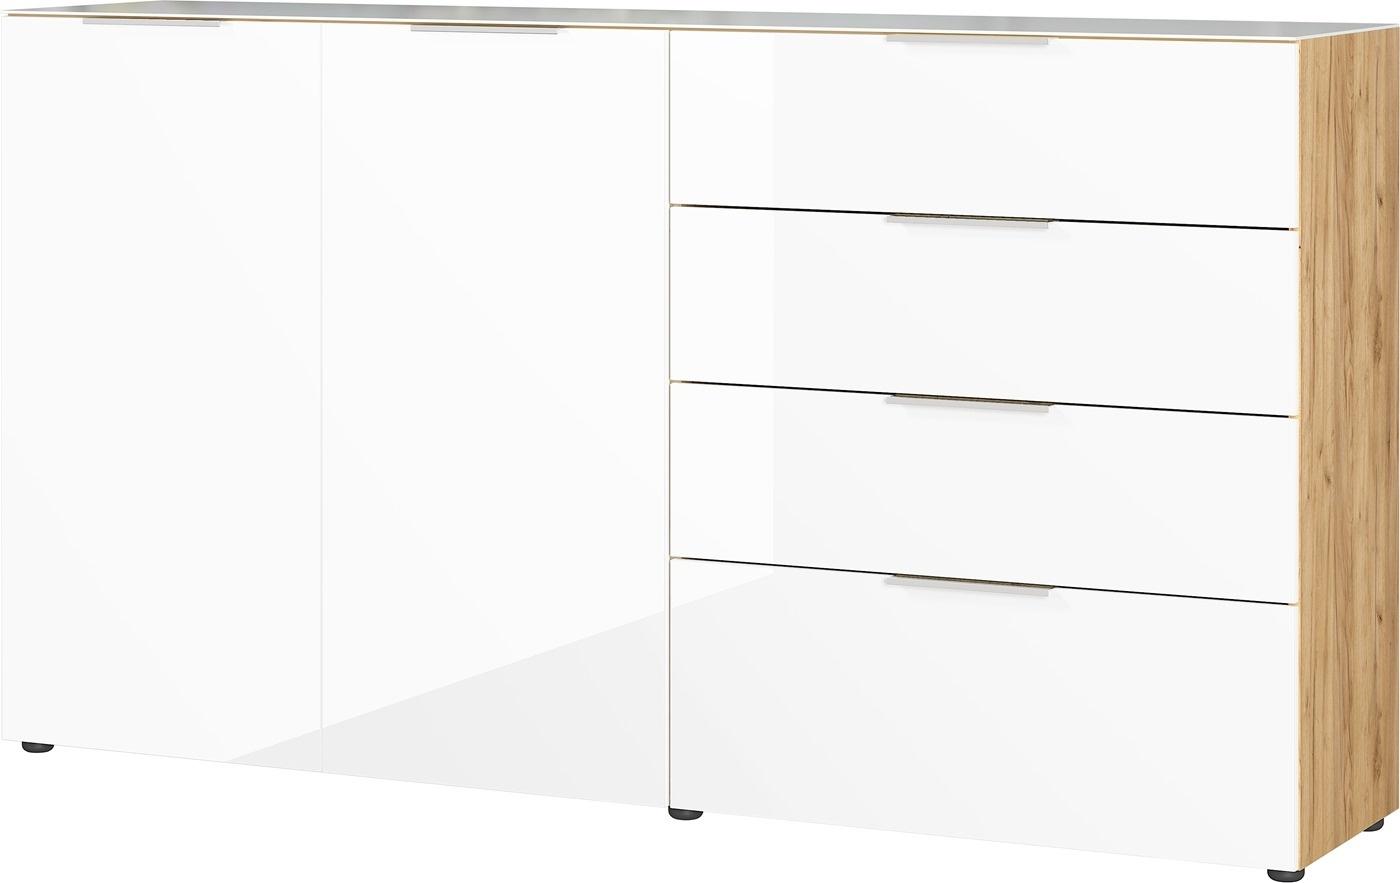 Dressoir Oakland 184 cm breed in wit met navarra eiken | Germania